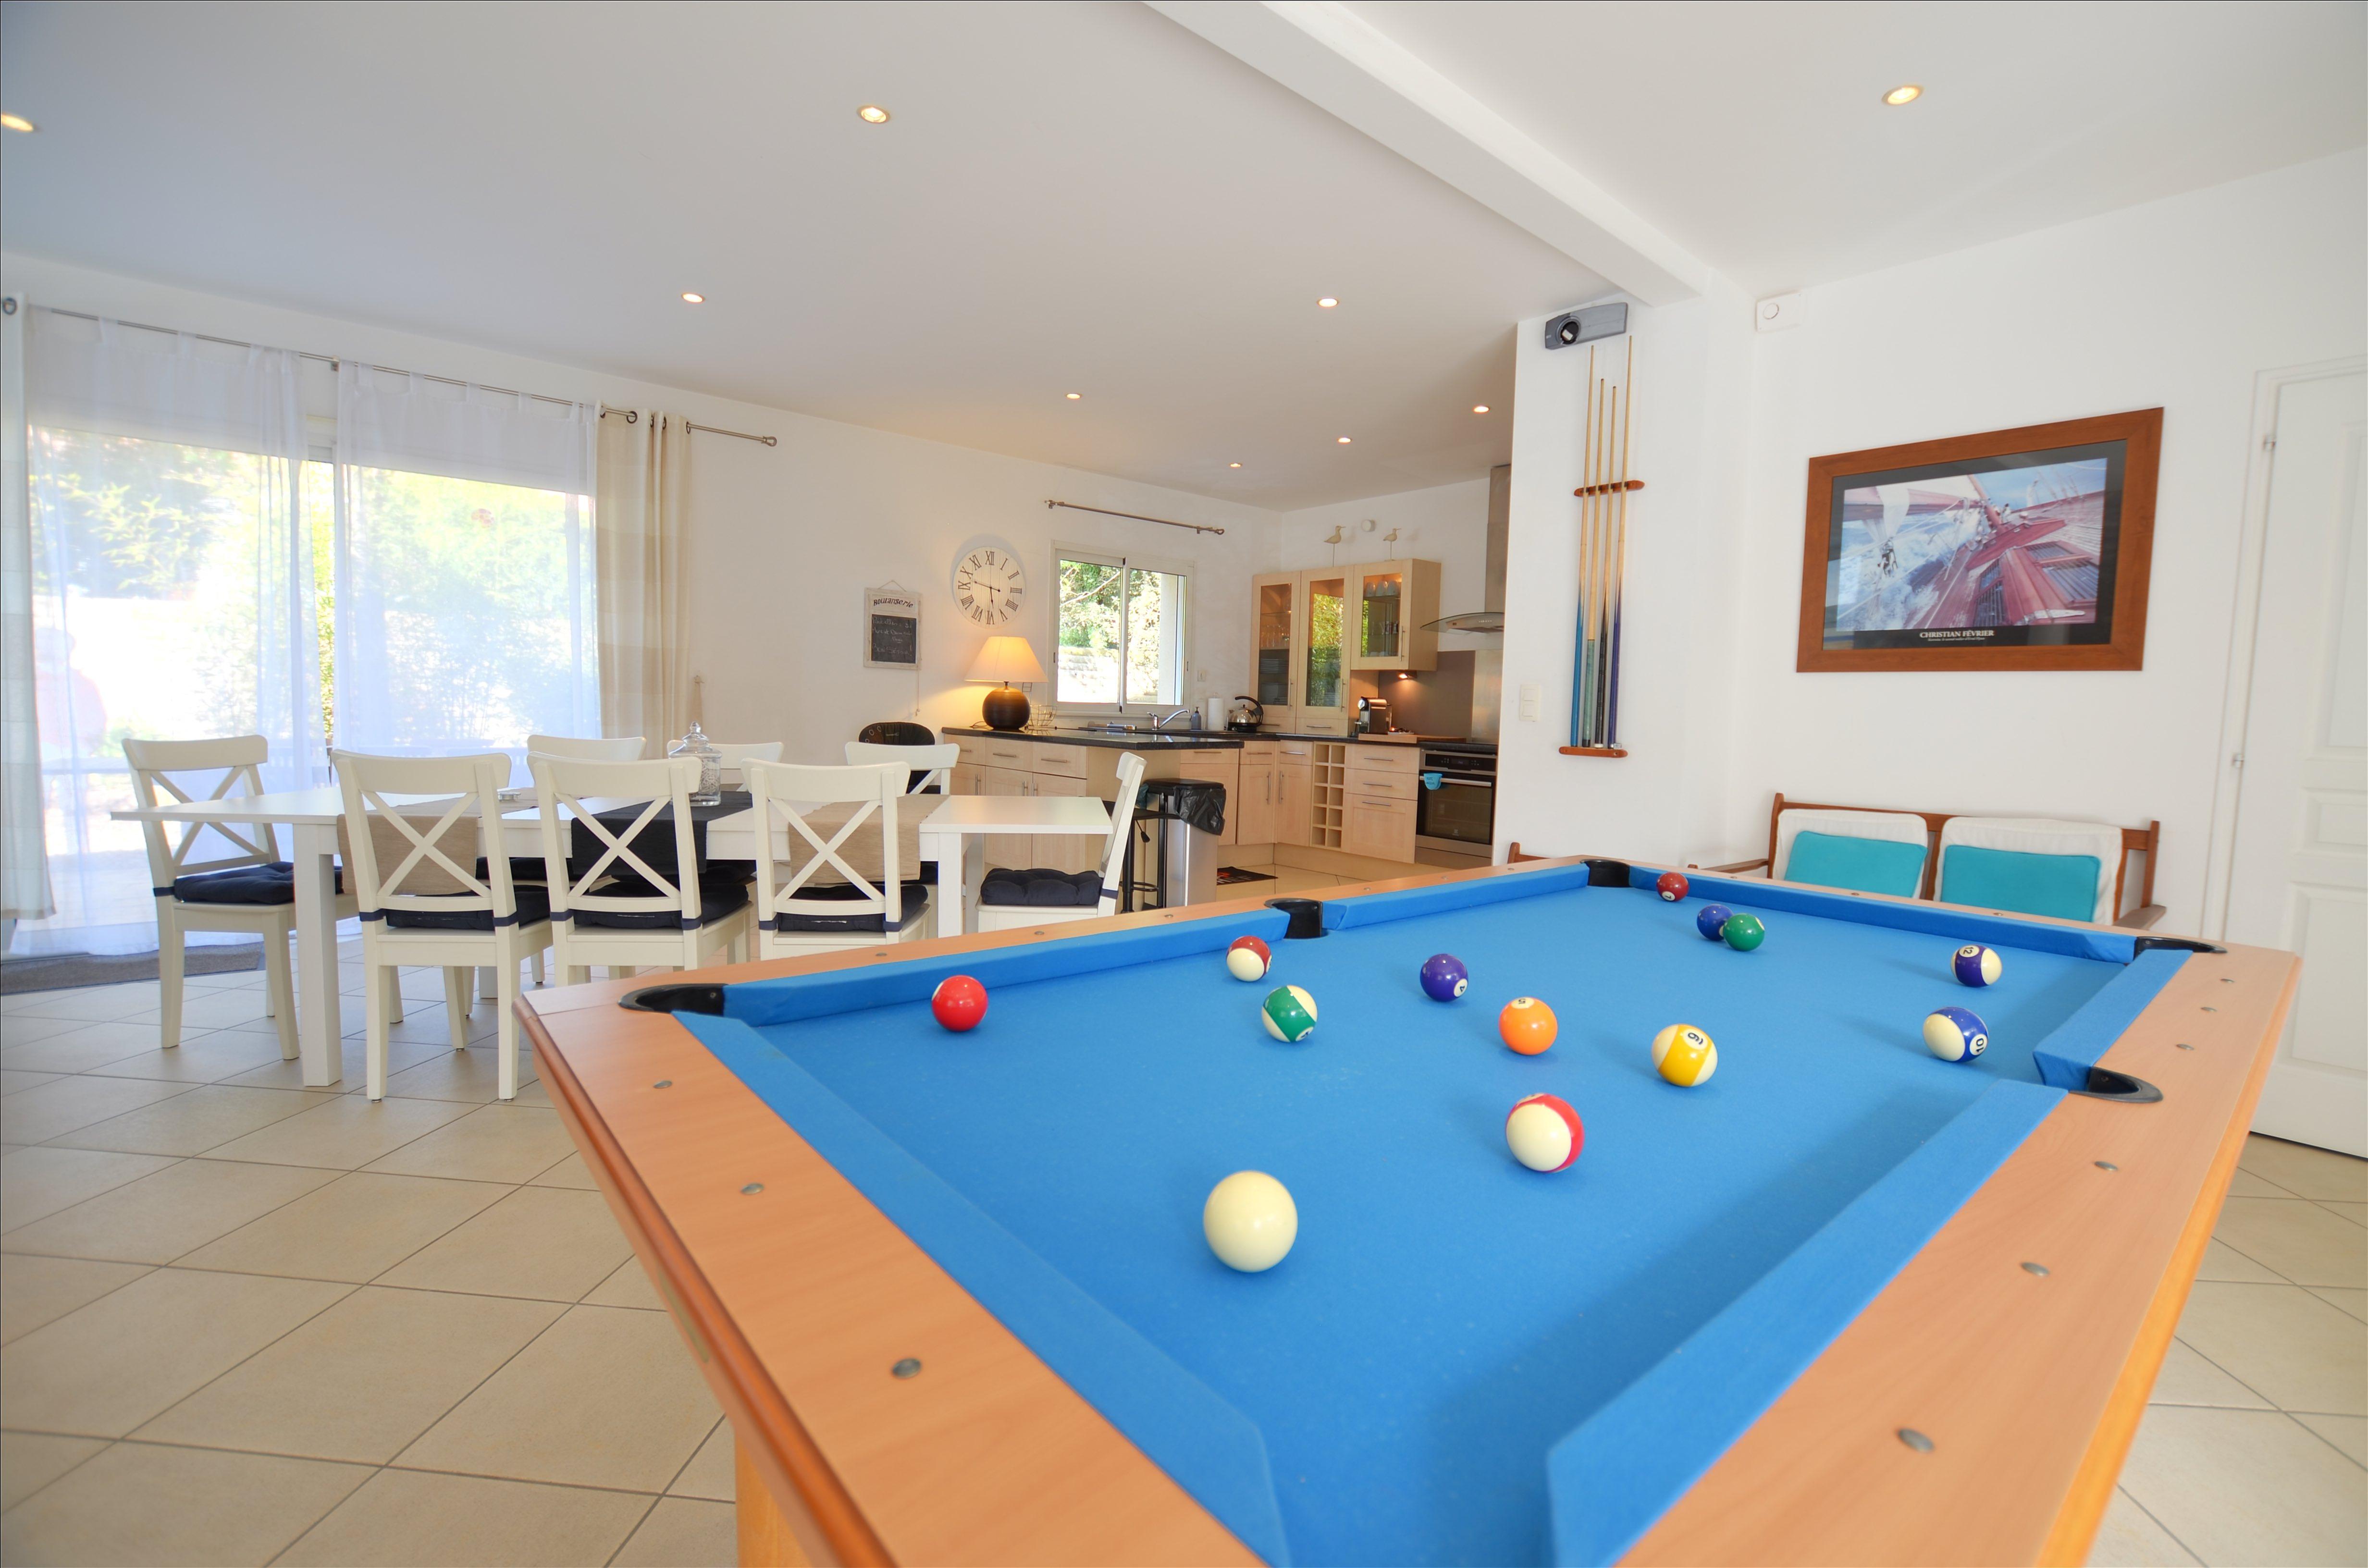 Location villa de luxe avec piscine int rieure en vend e for Piscine interieure de luxe